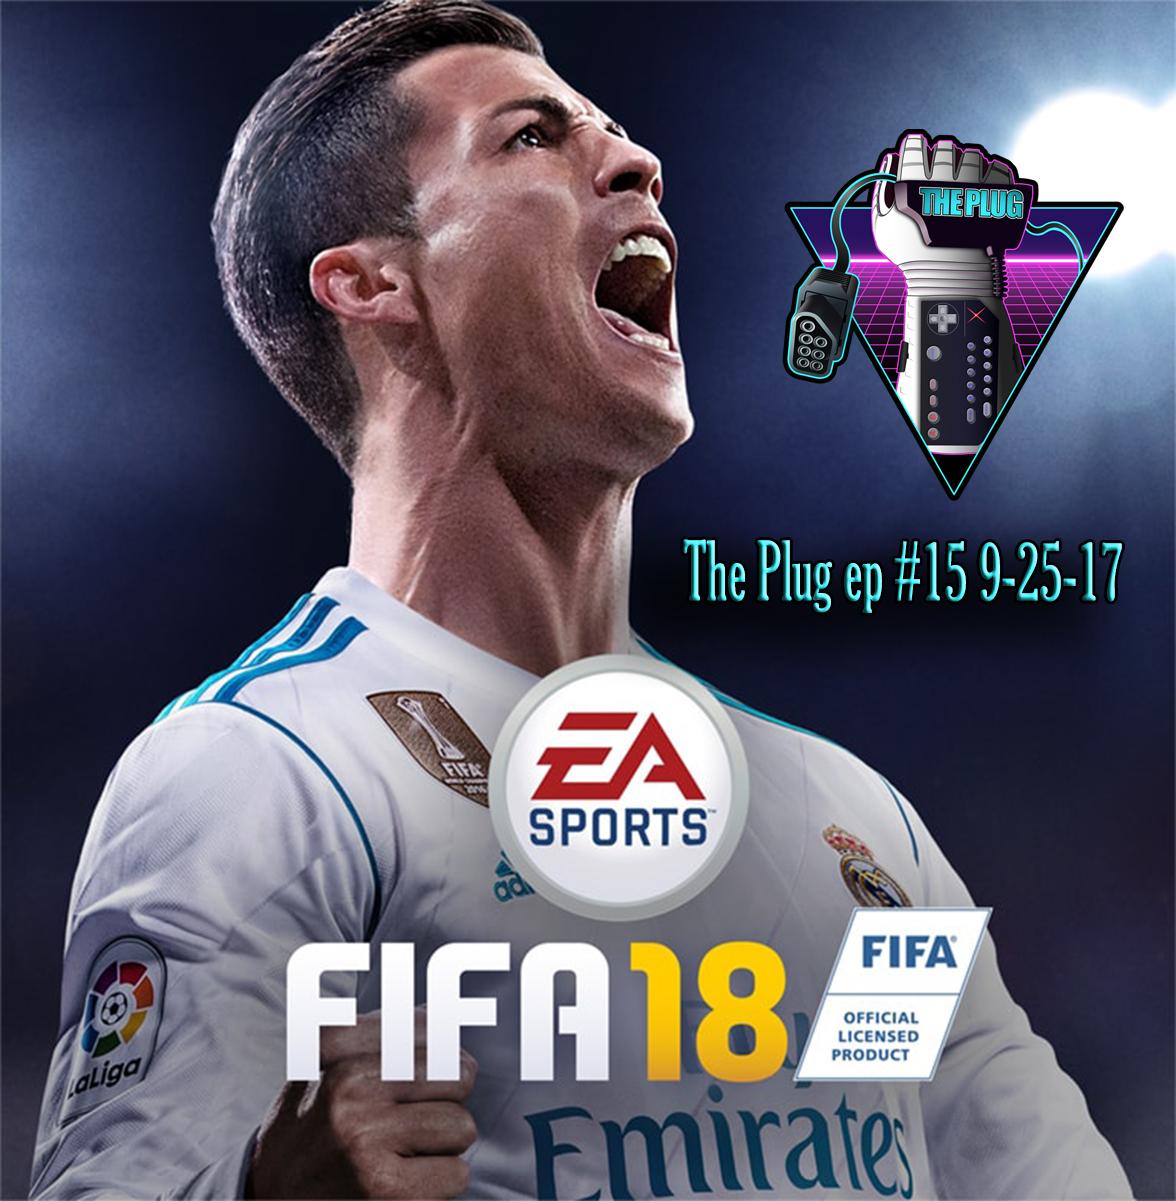 The Plug Ep #15 talking Fifa 18, Raiders of a broken planet, pubg vs epic 9-25-17